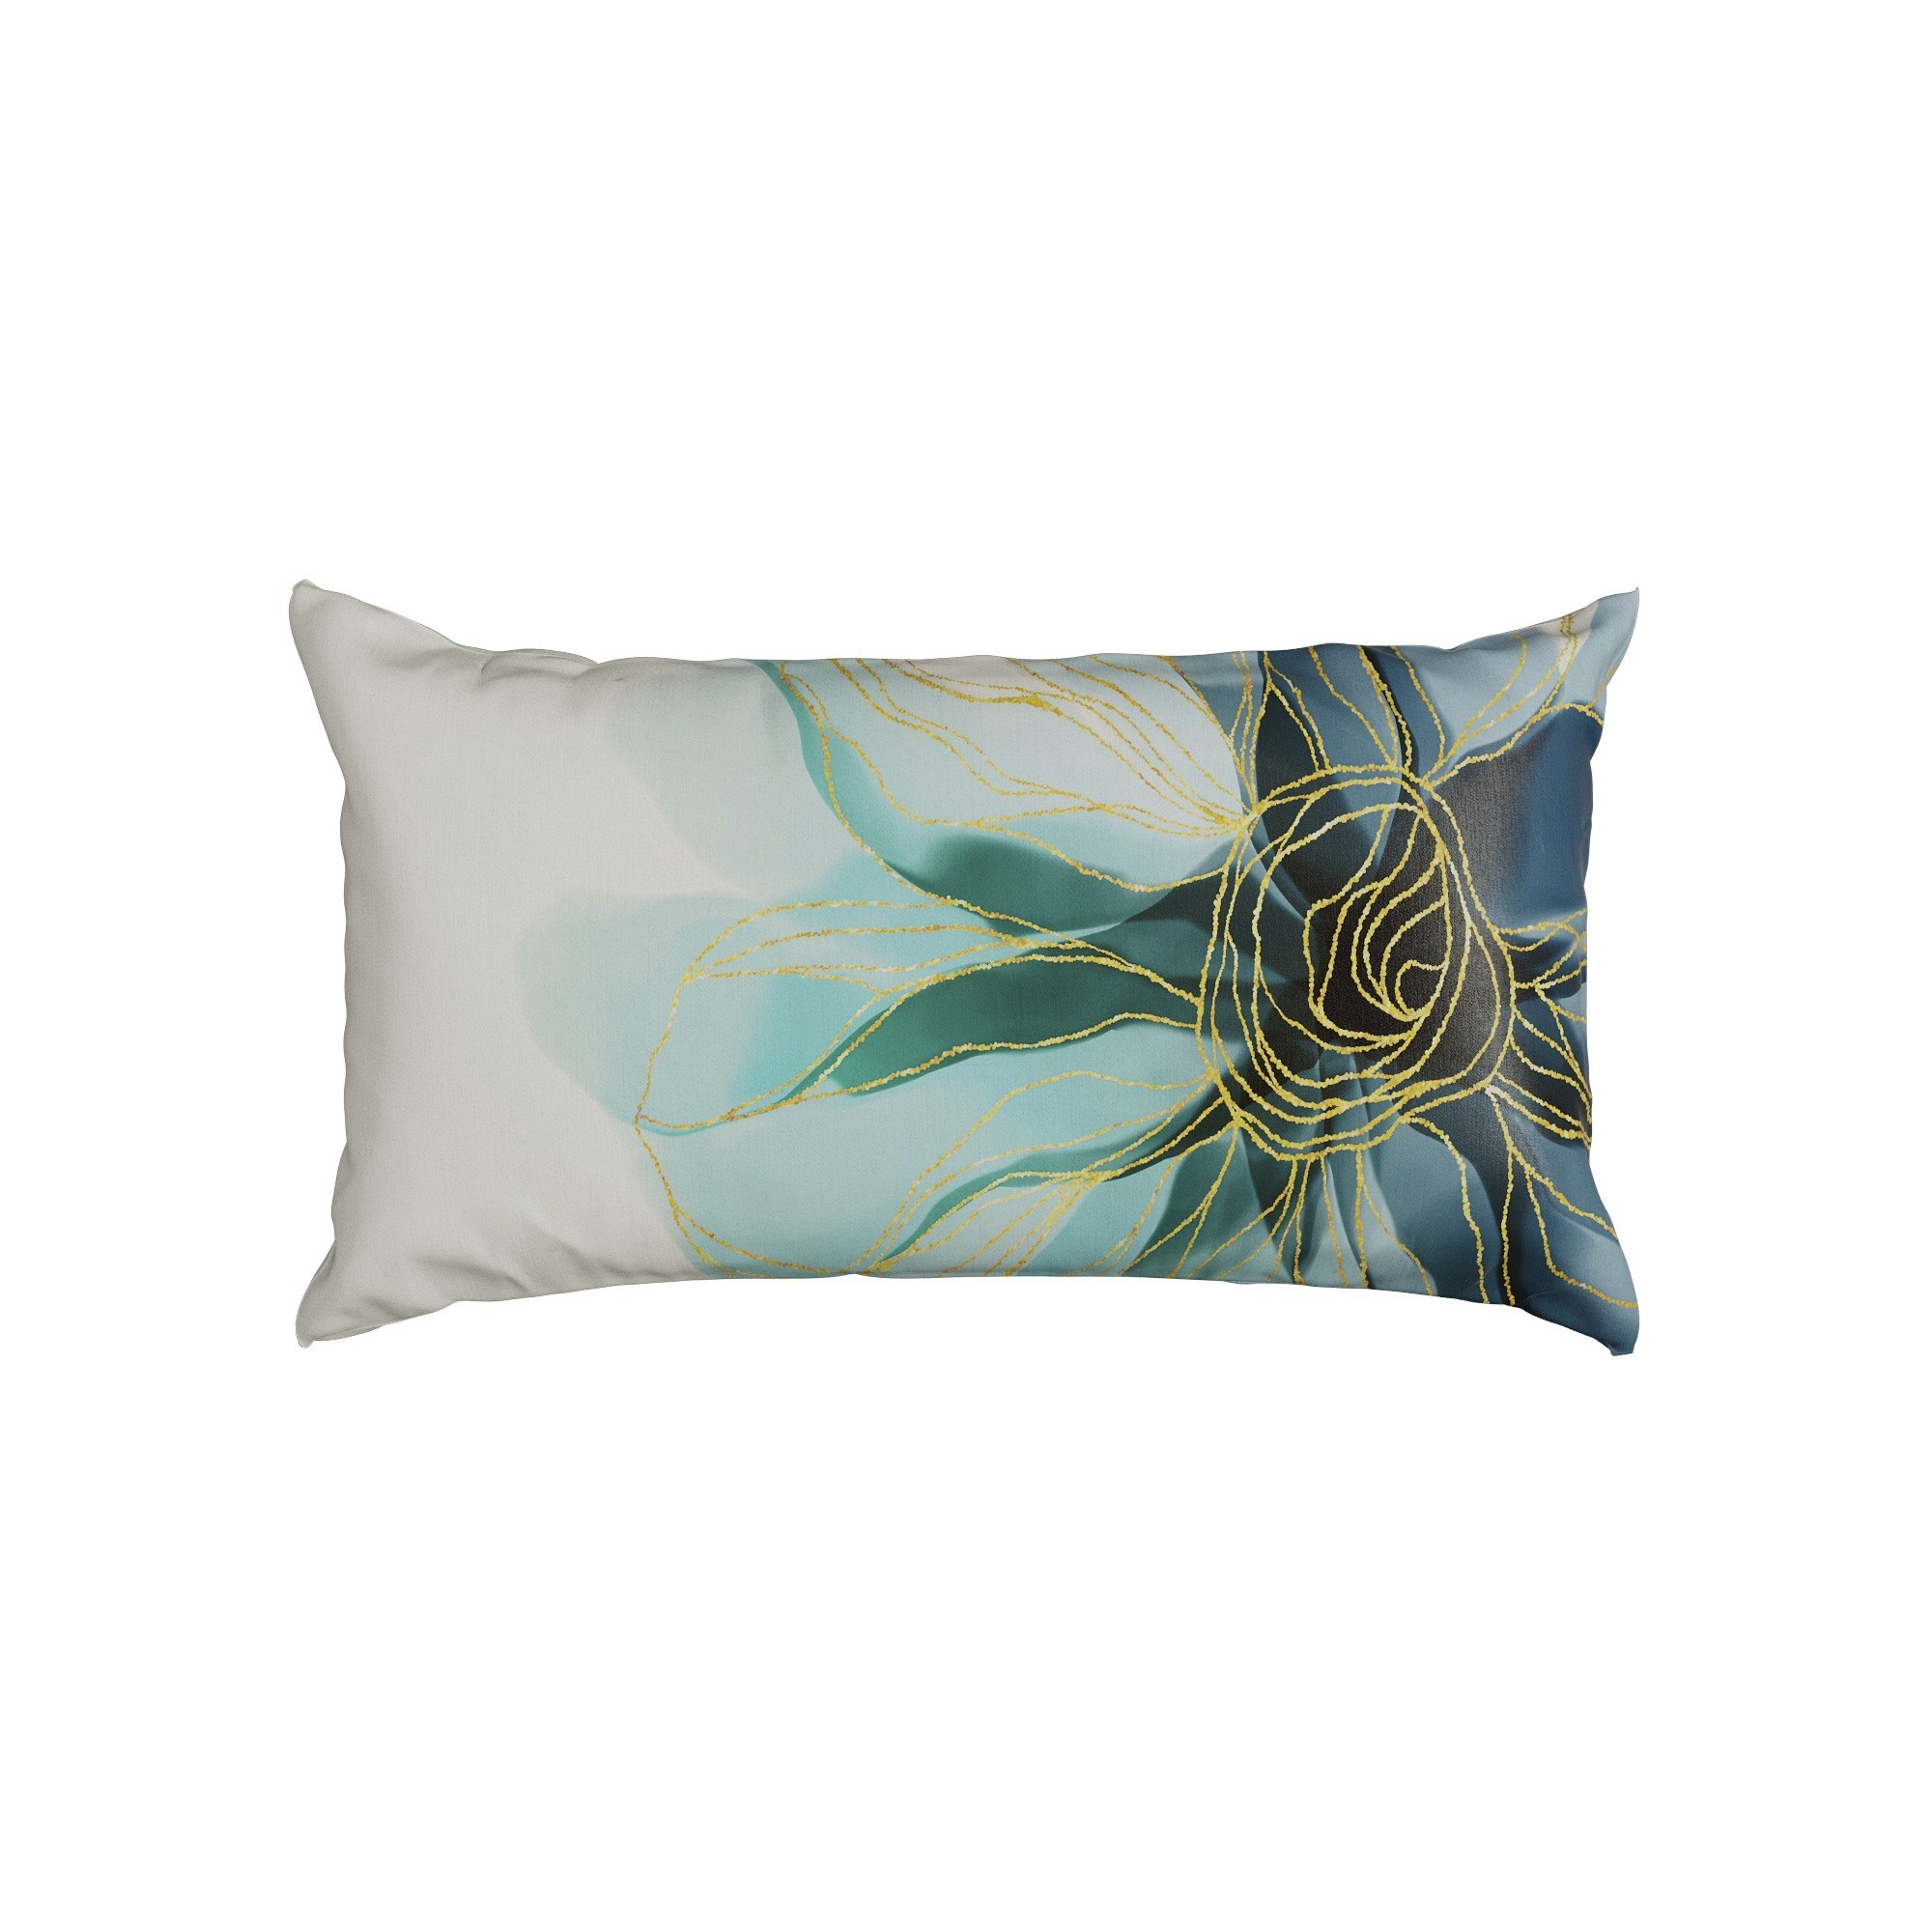 Almofada Silk Home 28x48 cm 0459 - Belchior